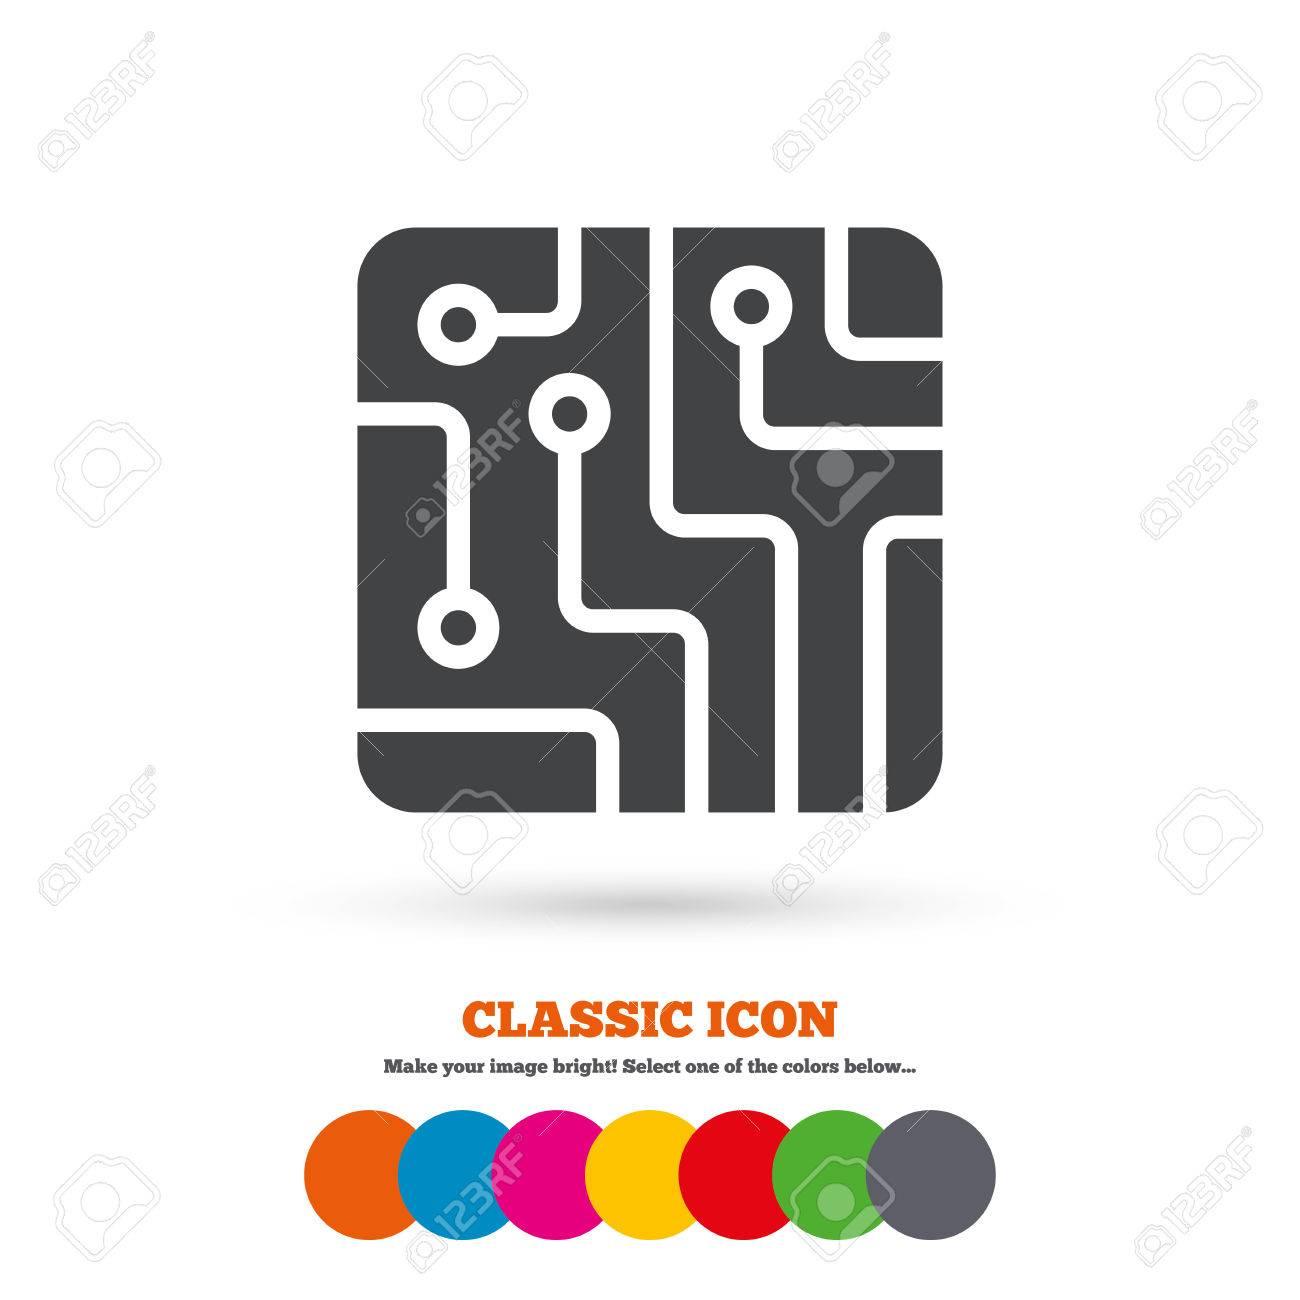 Famous Dc Supply Symbol Component - Wiring Diagram Ideas - guapodugh.com